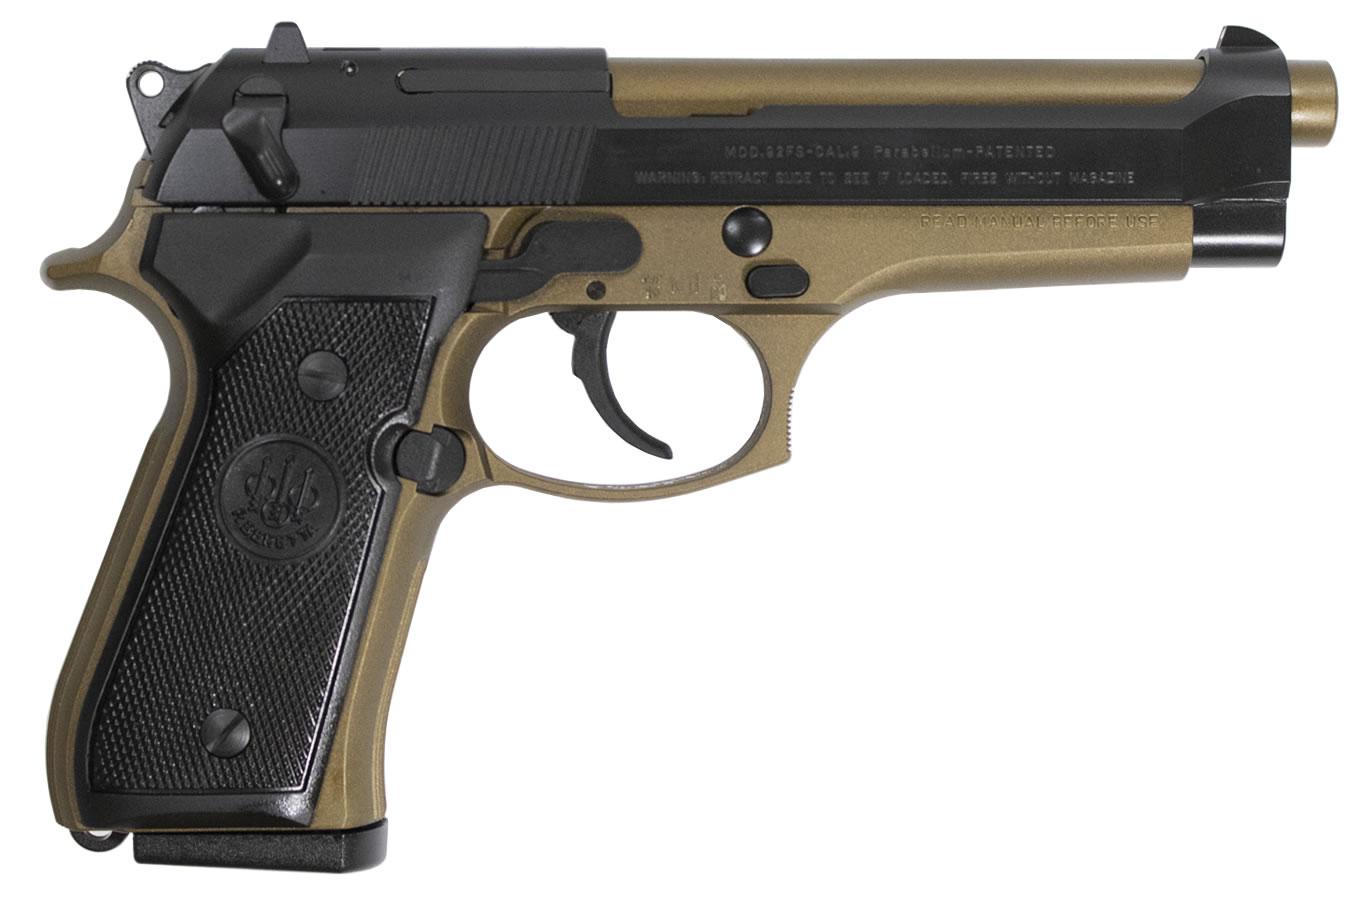 92FS 9mm DA/SA Pistol with Burnt Bronze Frame